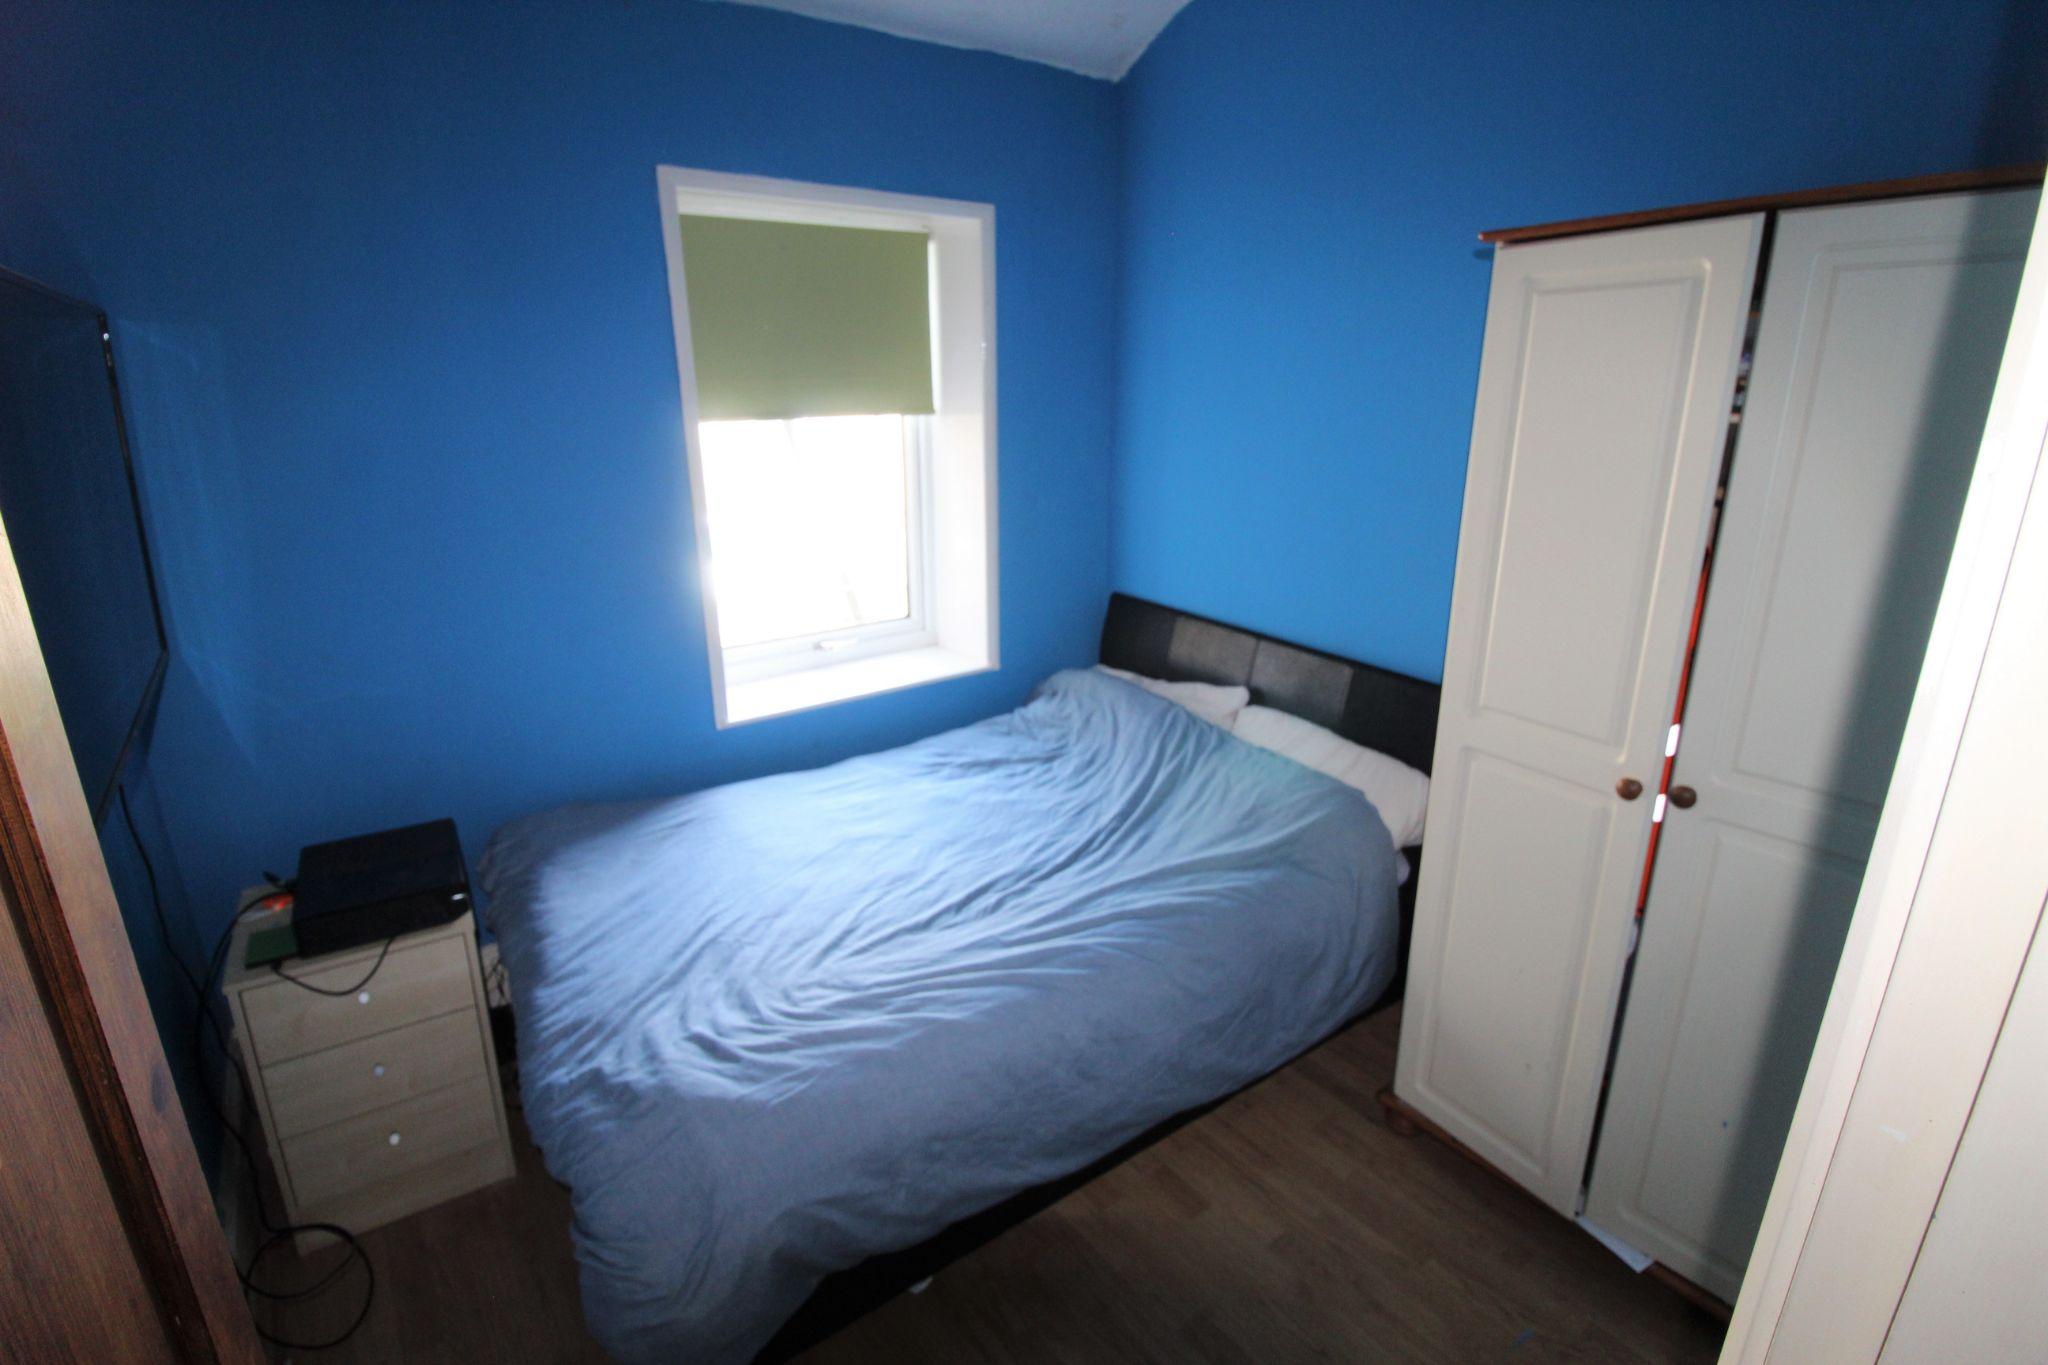 3 bedroom mid terraced house SSTC in Bradford - Bedroom 3